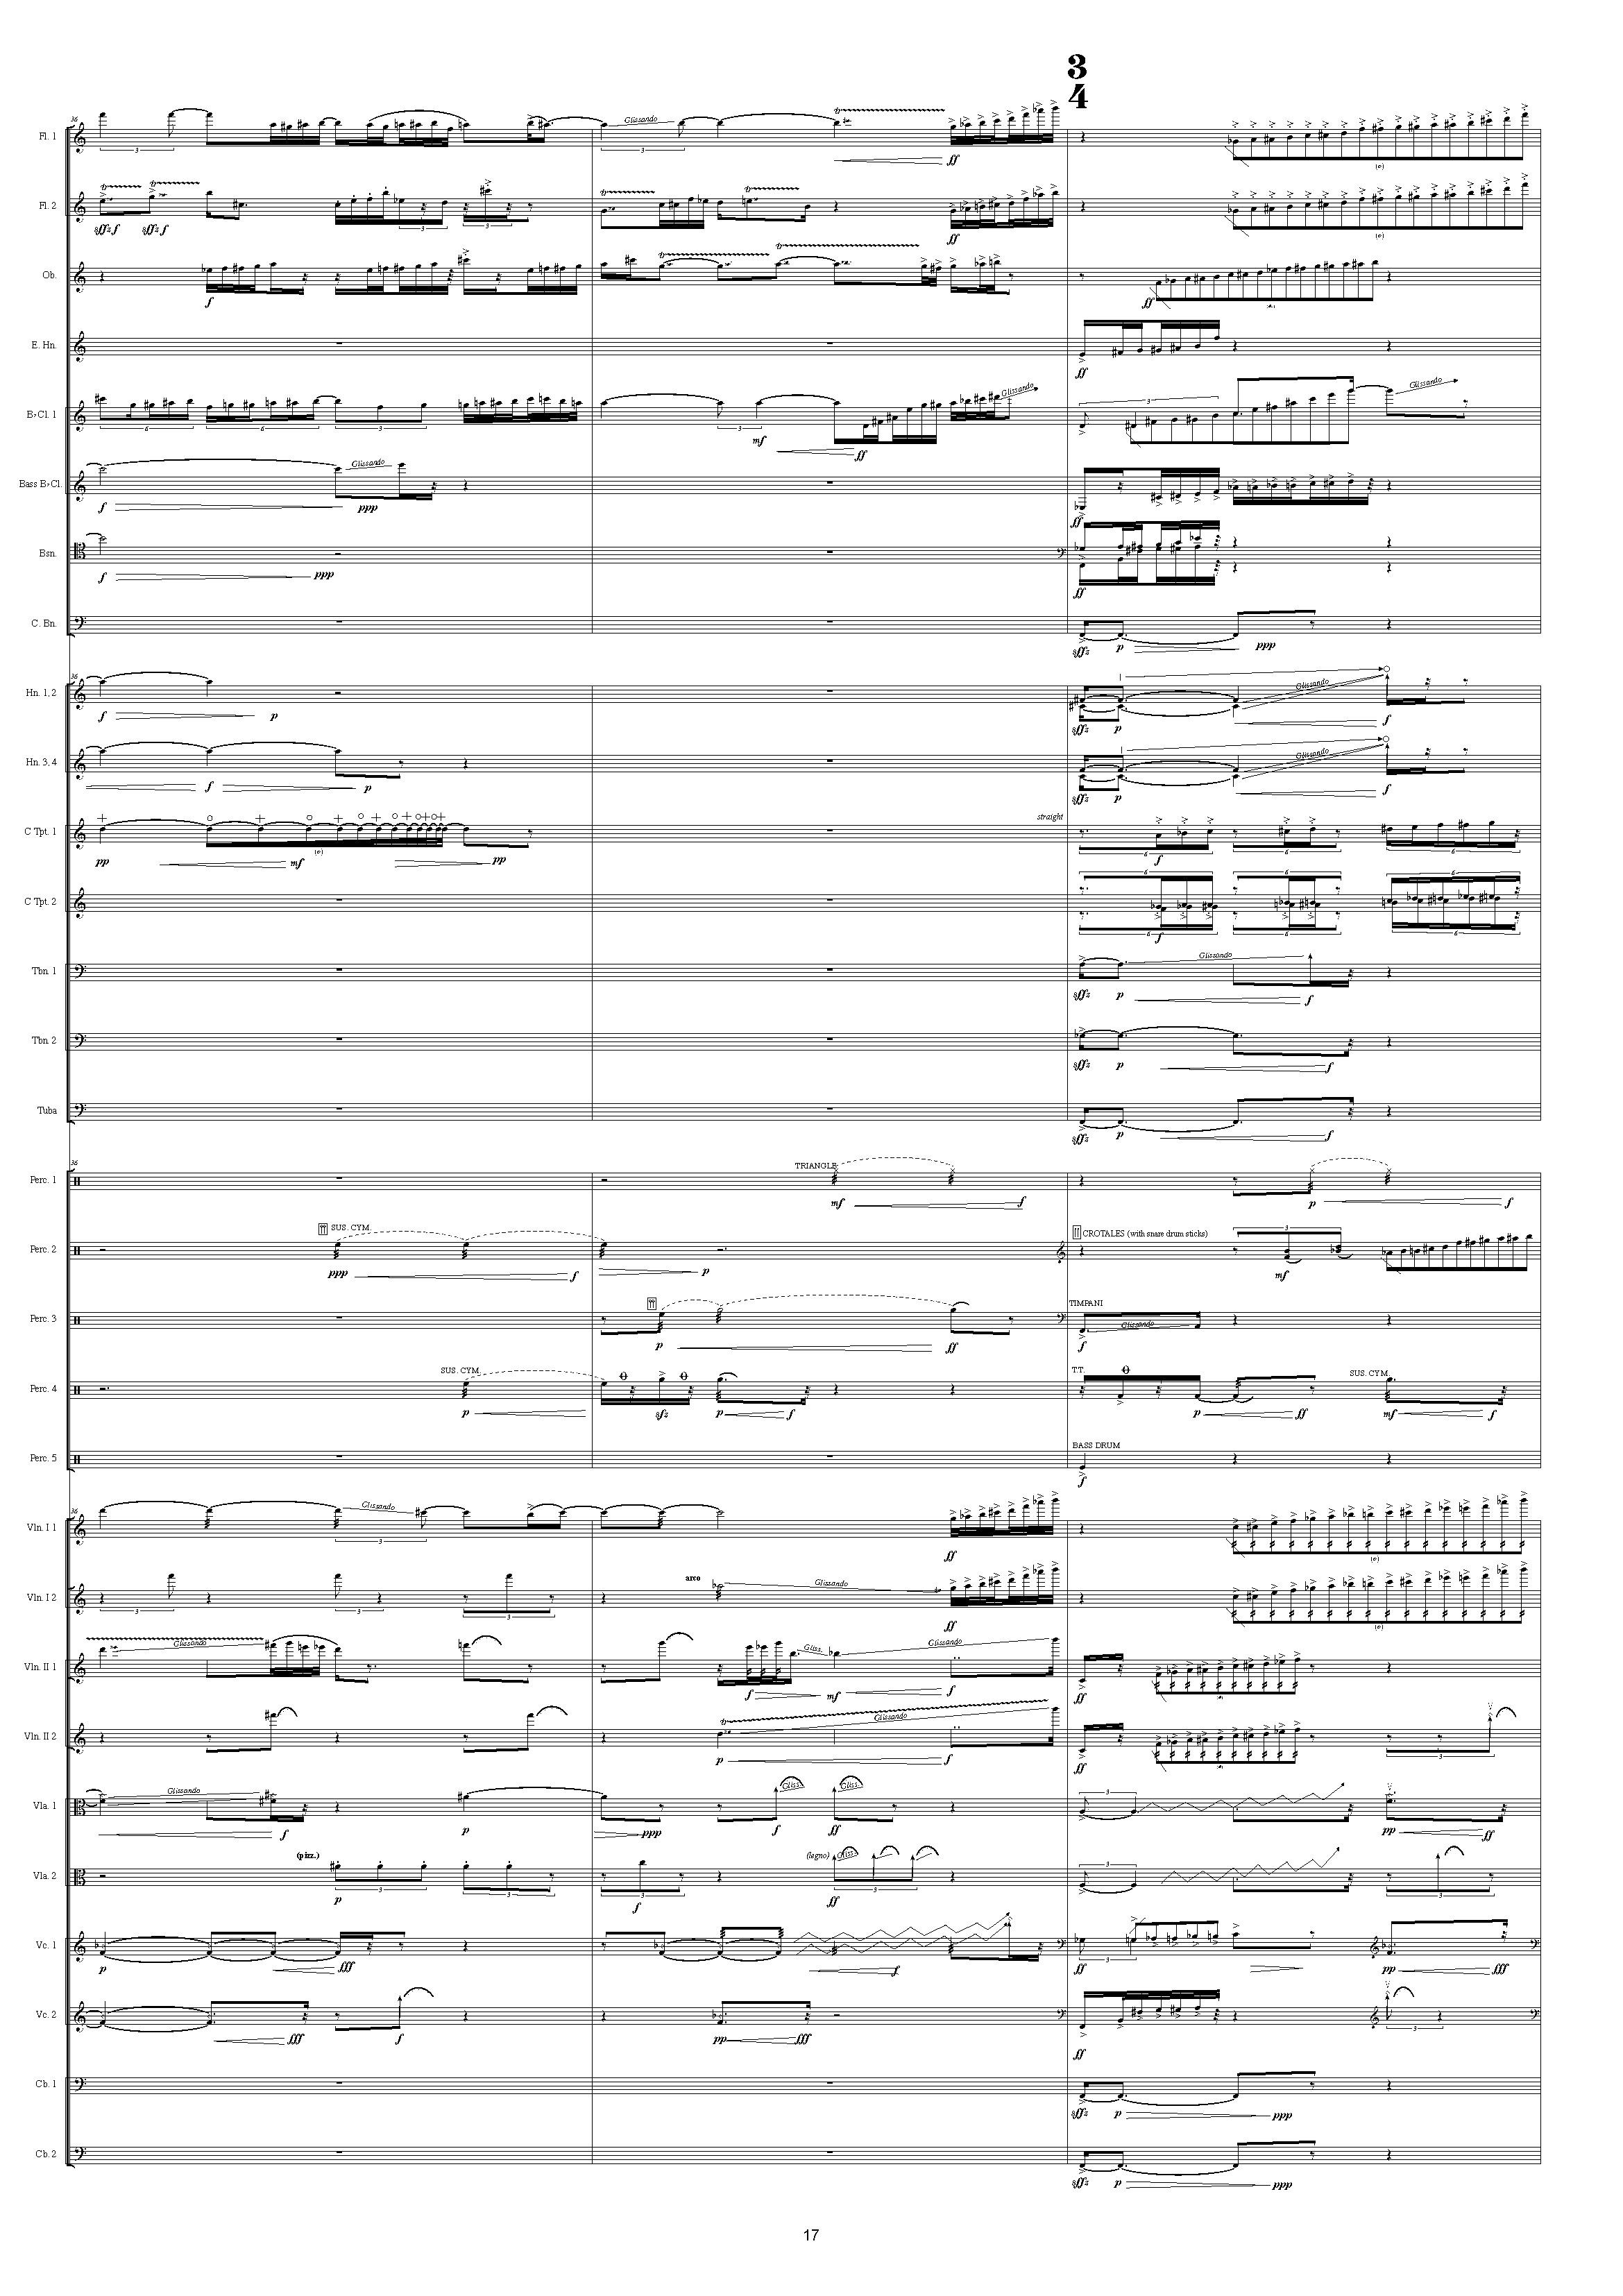 METANOIA_2009-RAPPOPORT_Seite_17.jpg